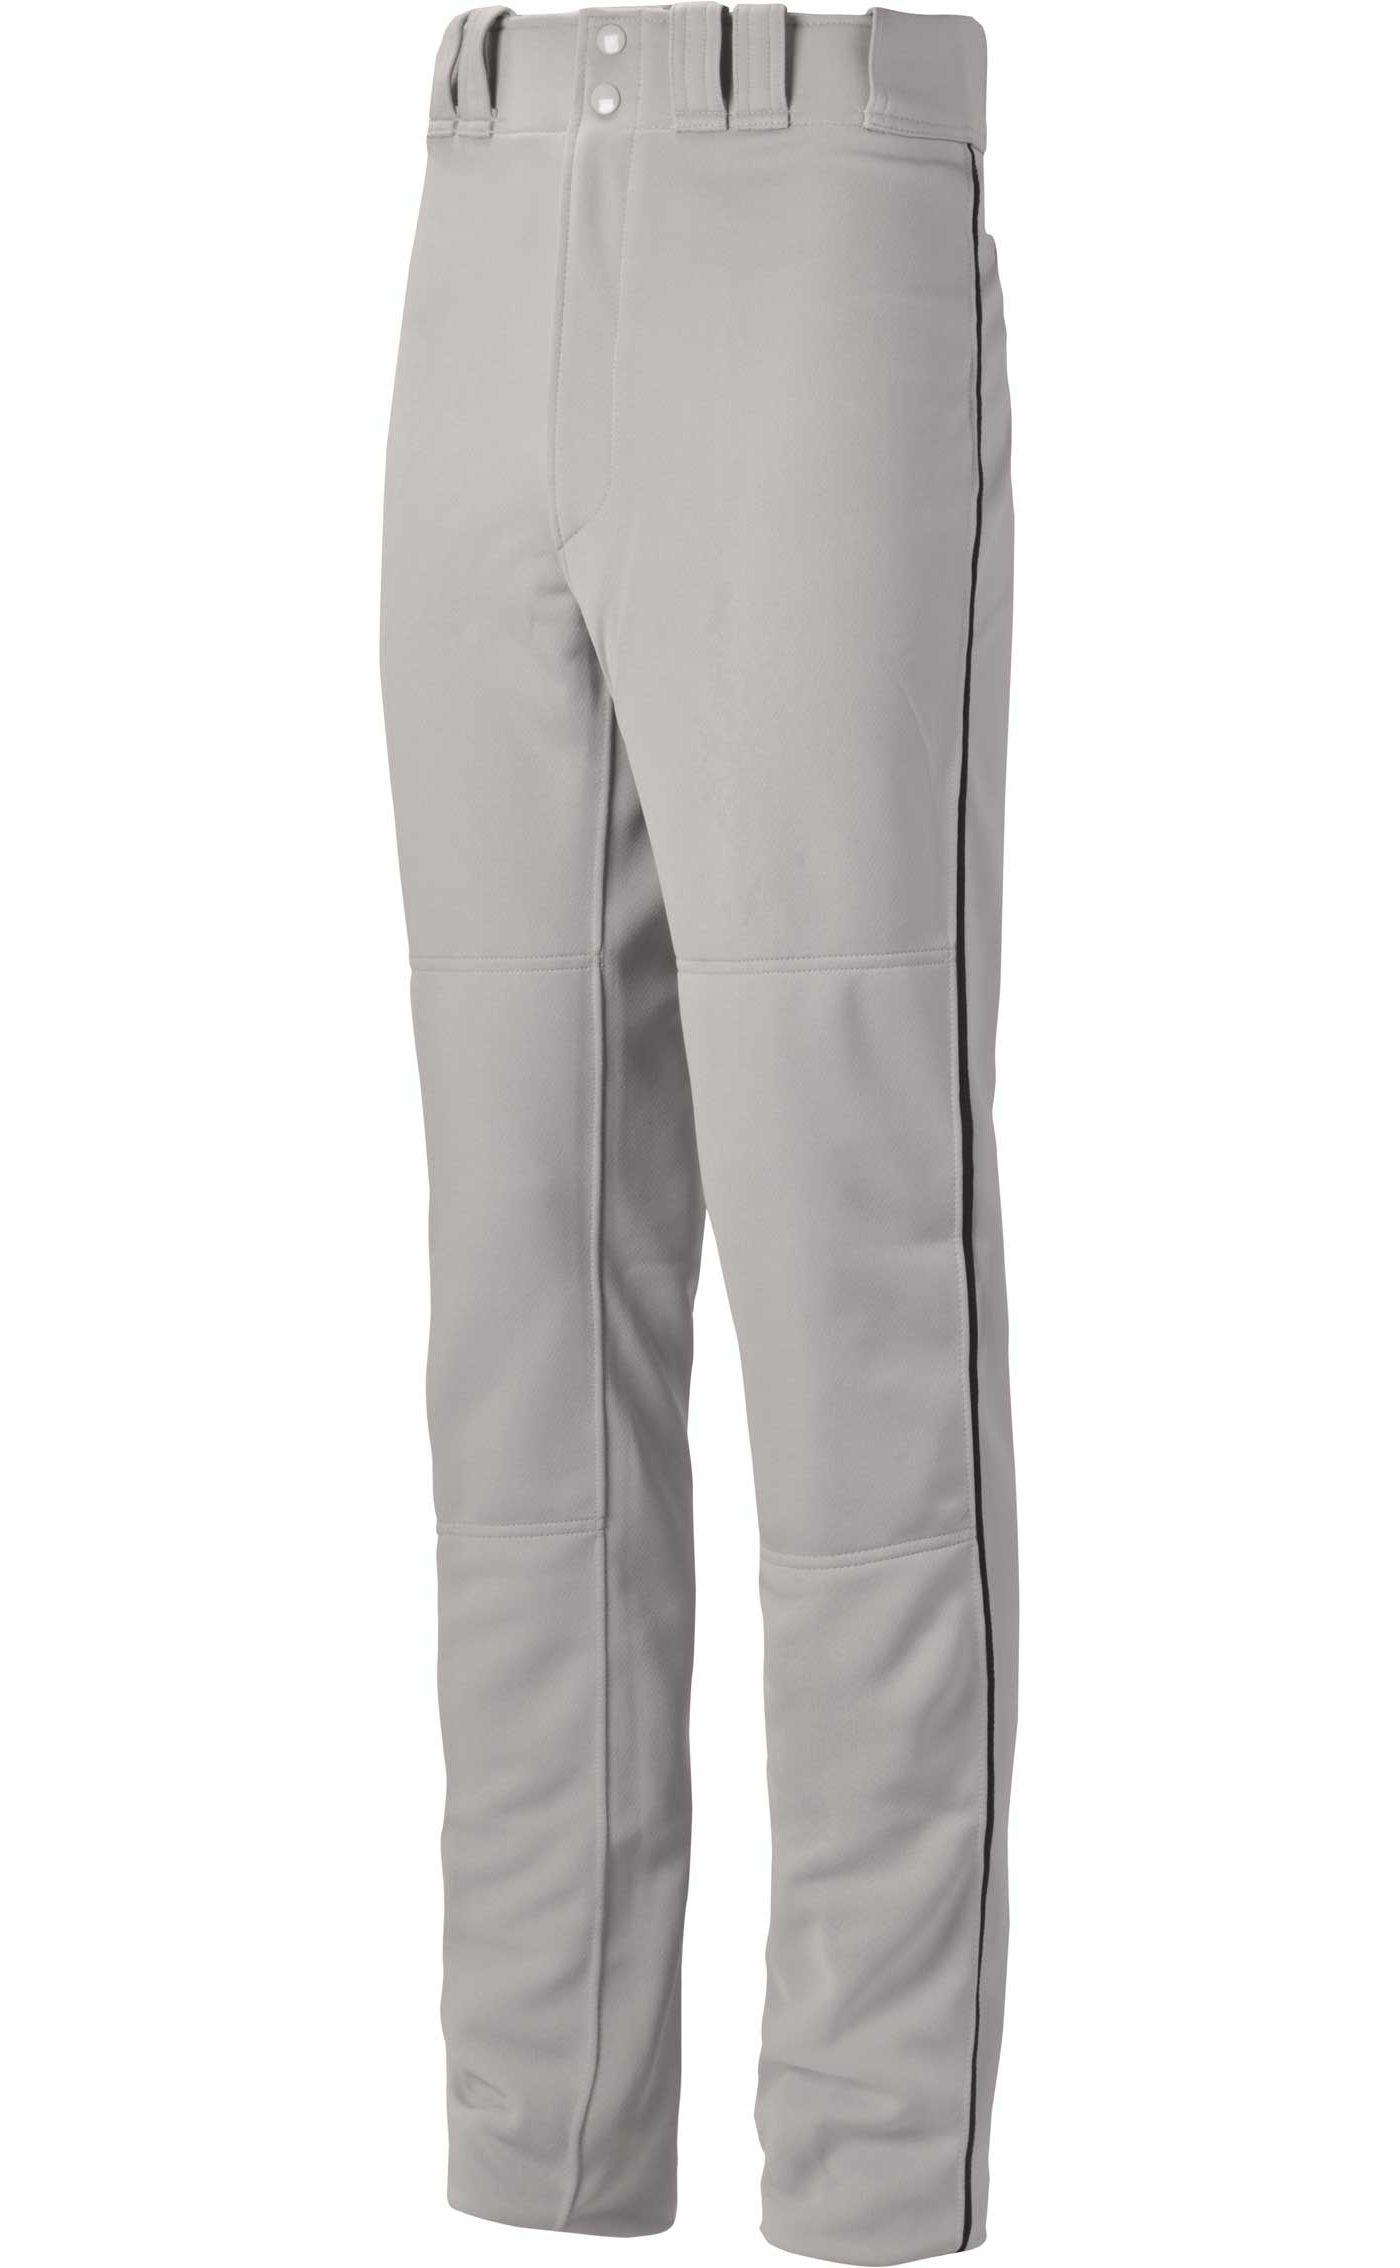 Mizuno Men's MVP Pro Piped Baseball Pants